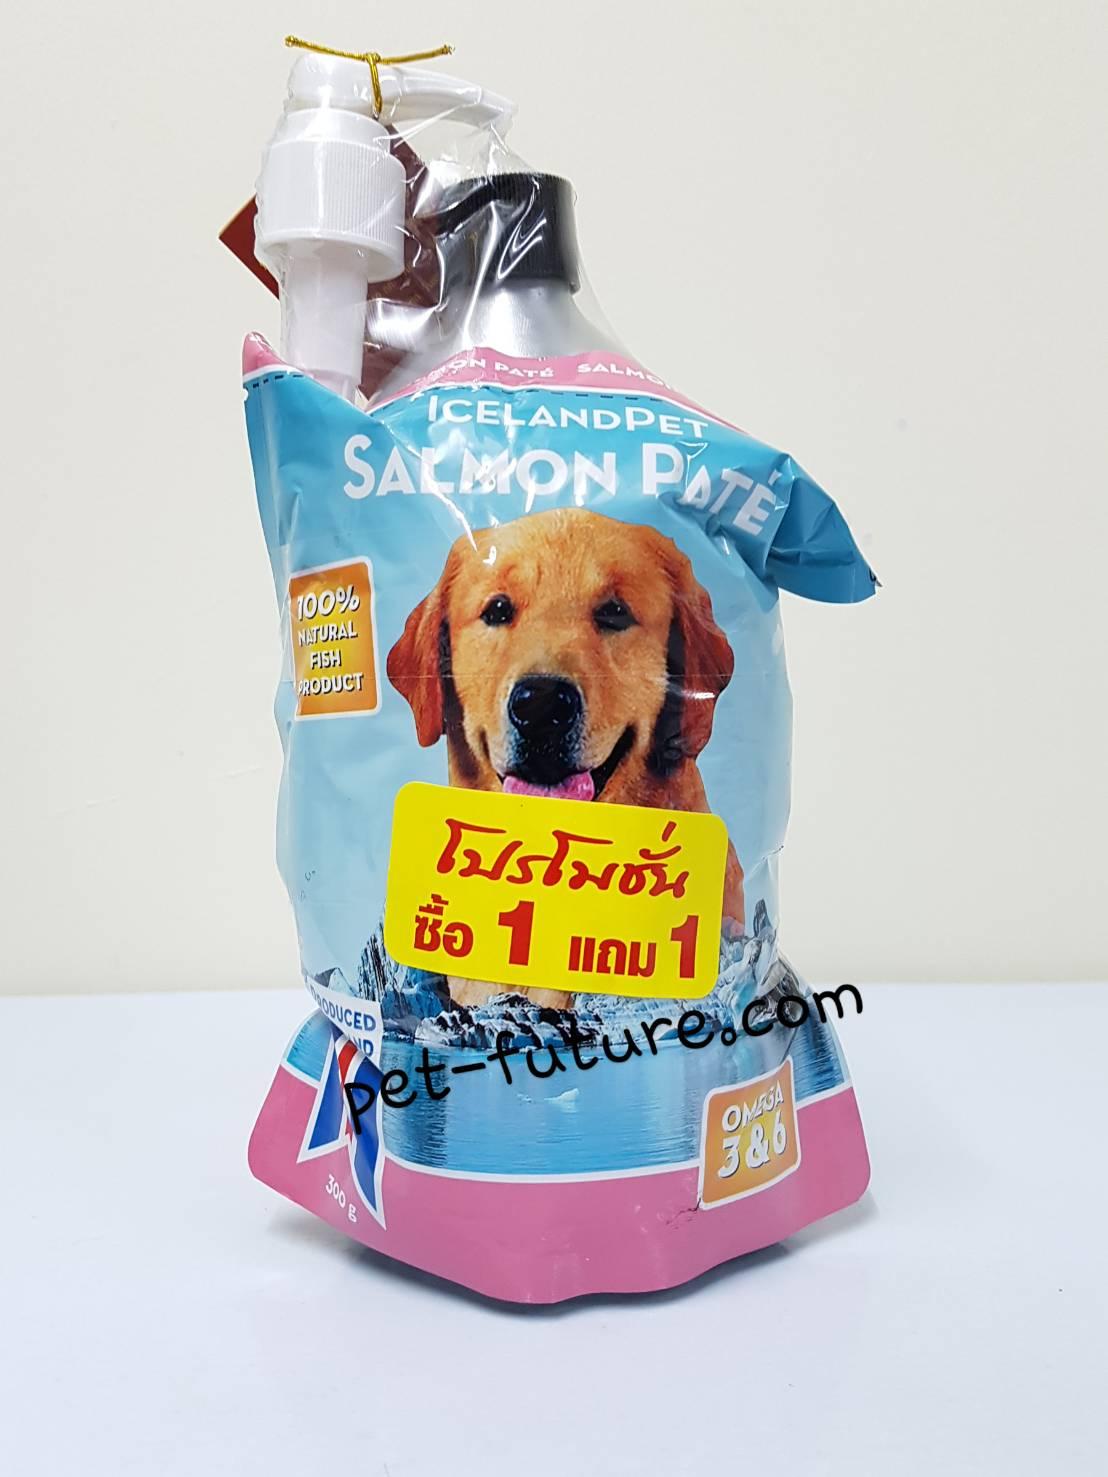 Salmon oil dogs fish(บำรุงขน ผิวหนังจร้า ได้ผลตอบรับดีค่ะ) หมดอายุ 08/18